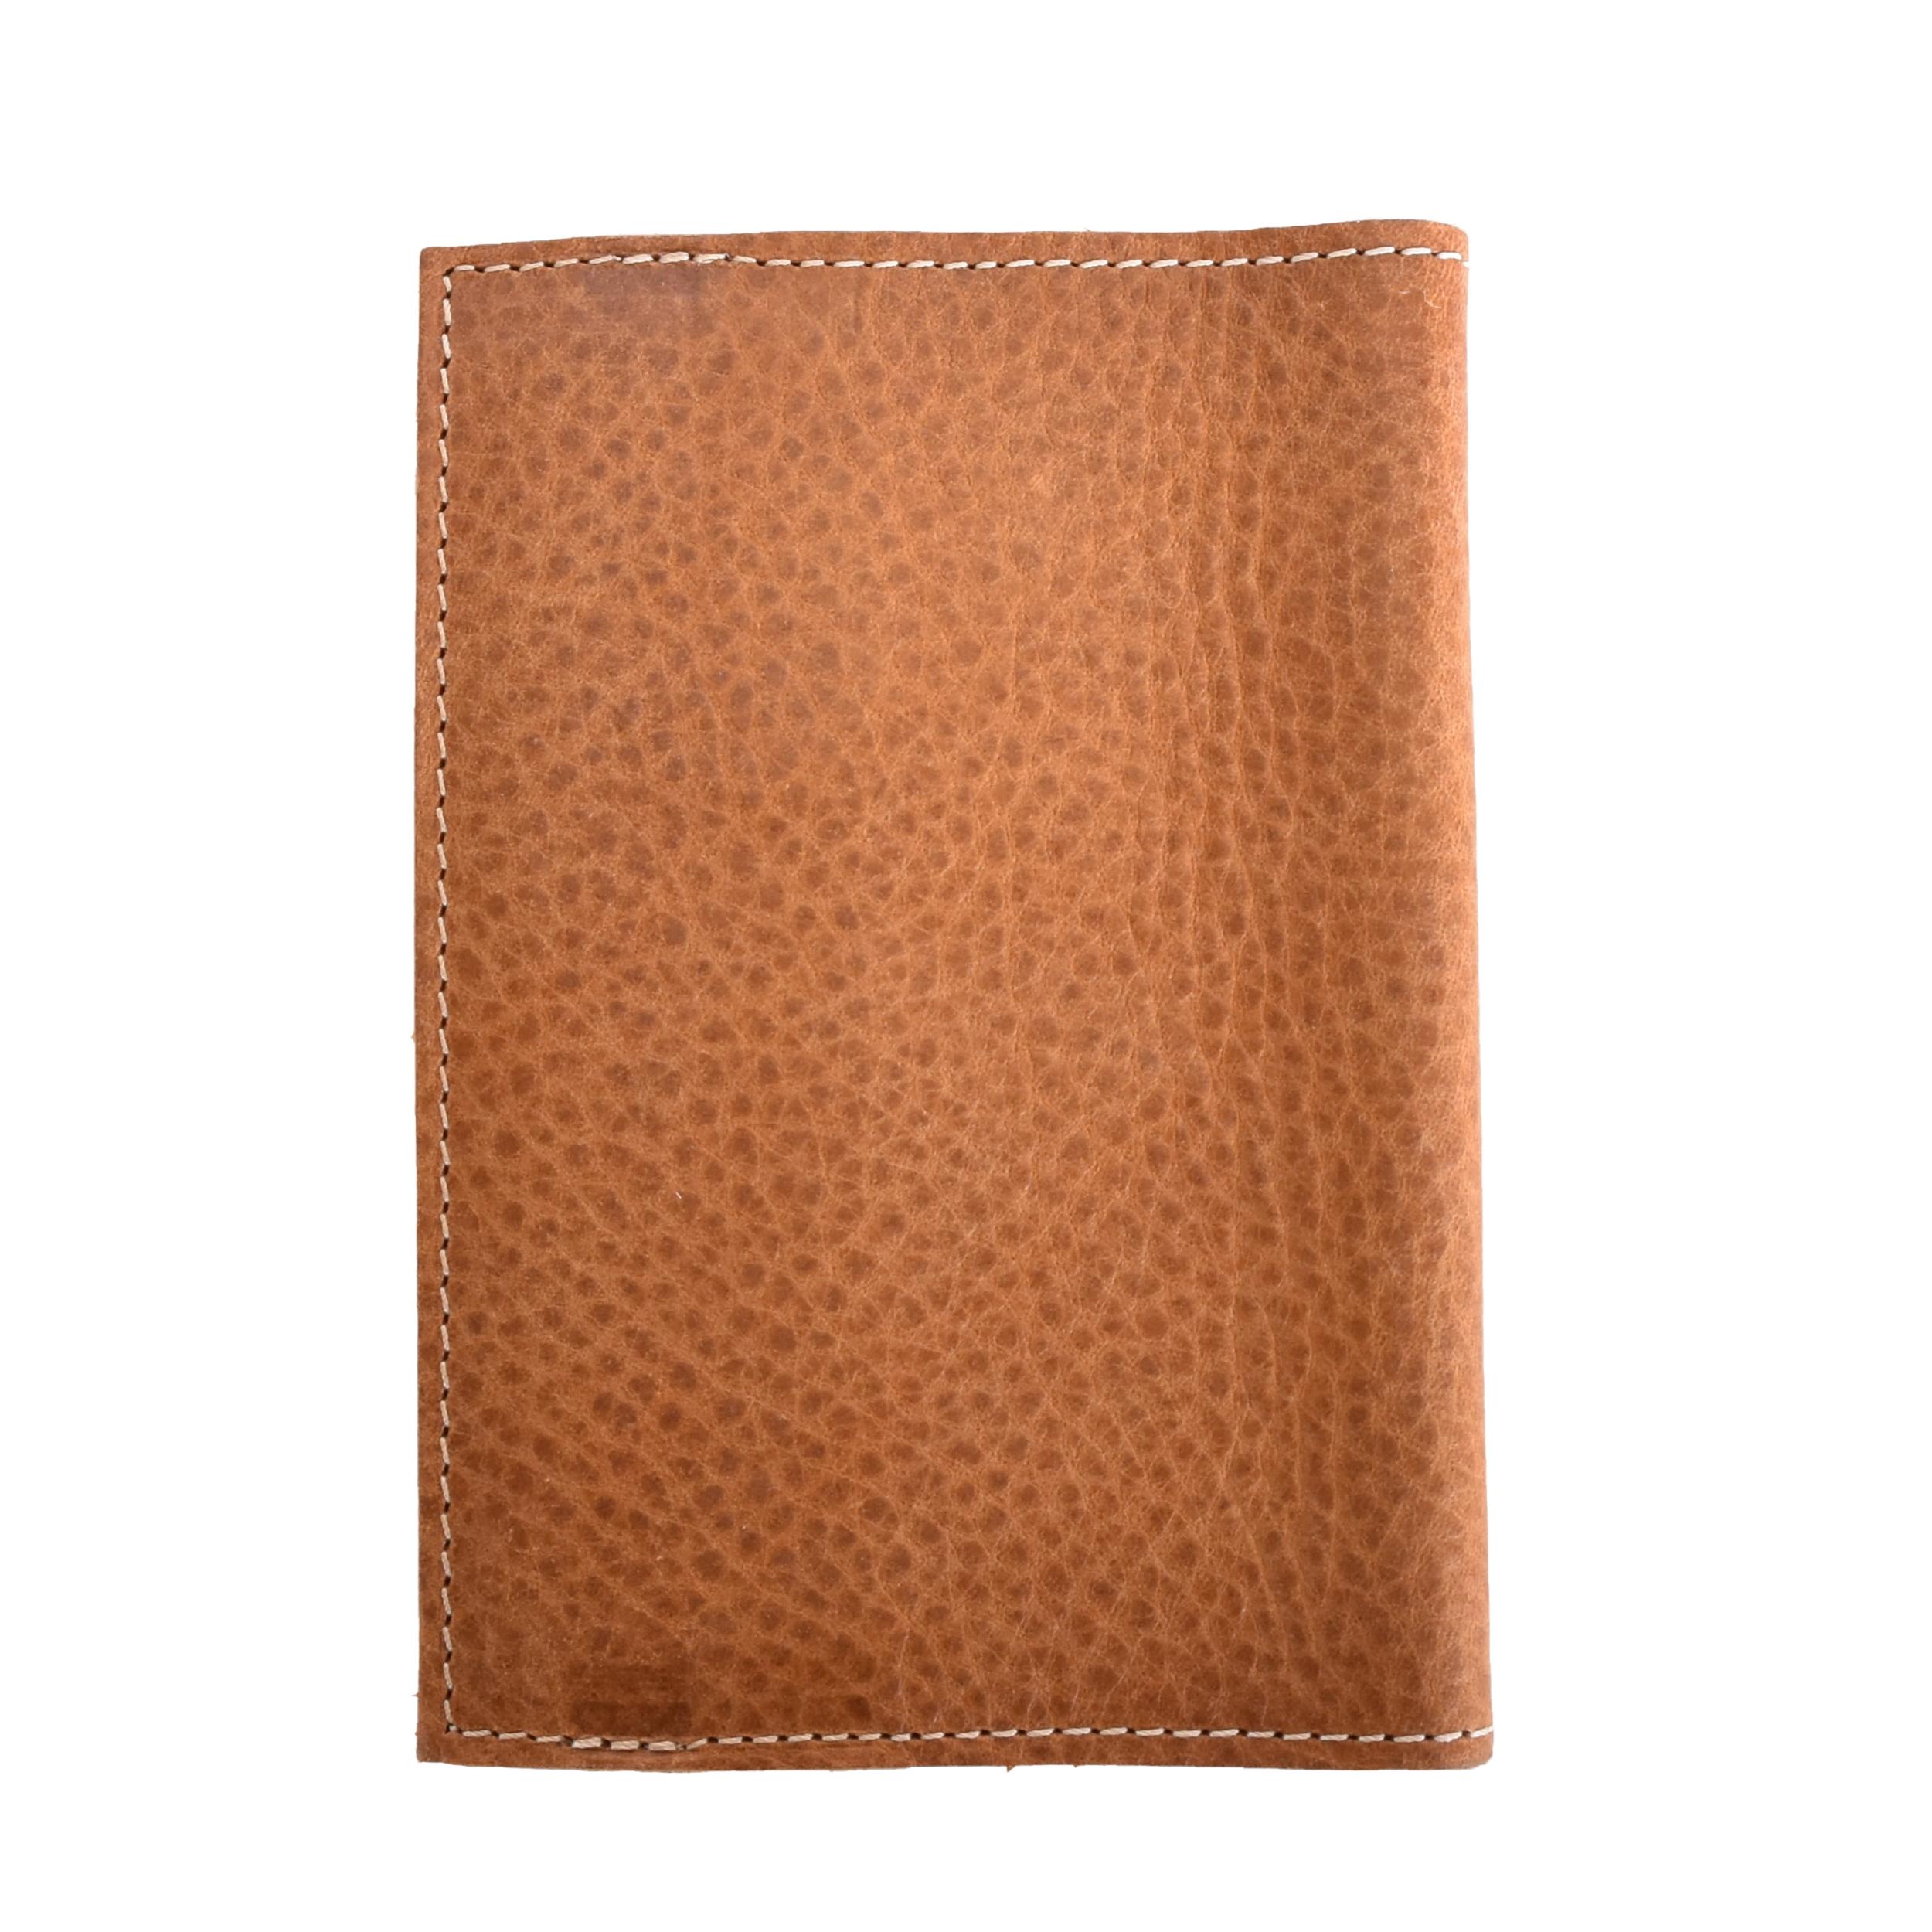 Passeport caramel 2